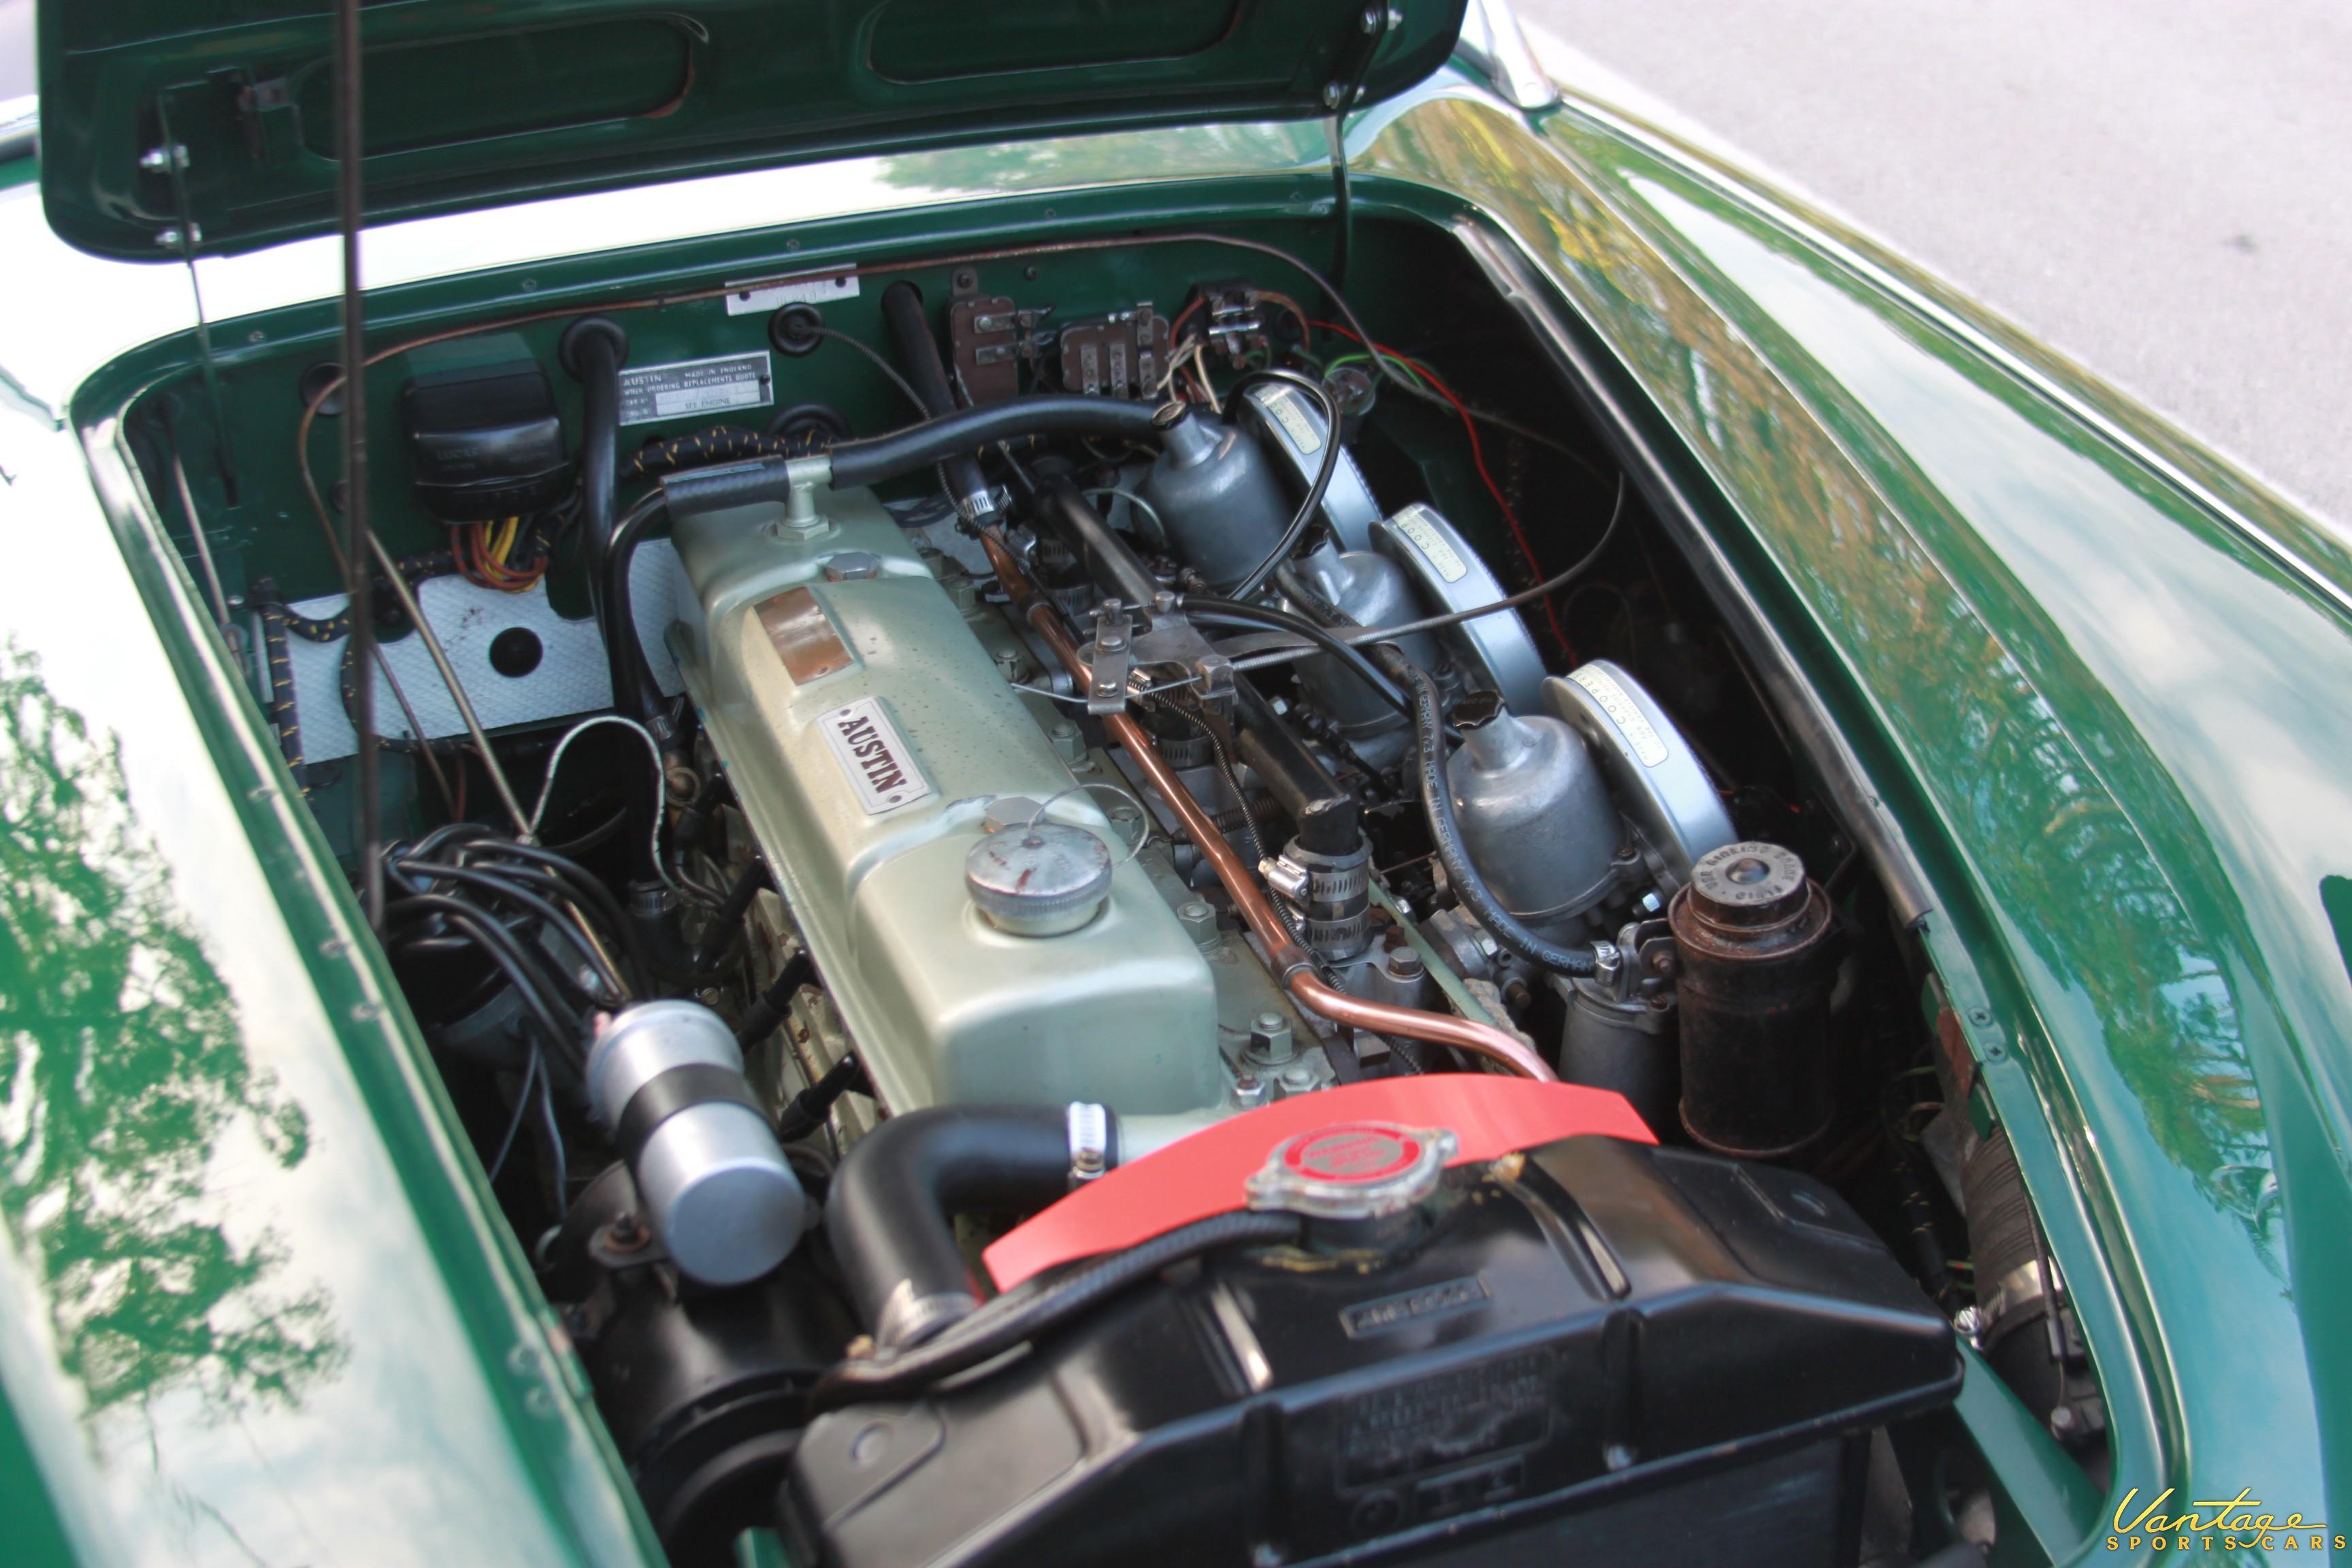 1961 Austin Healey 3000 Mk I- SOLD! - Vantage Sports Cars ...